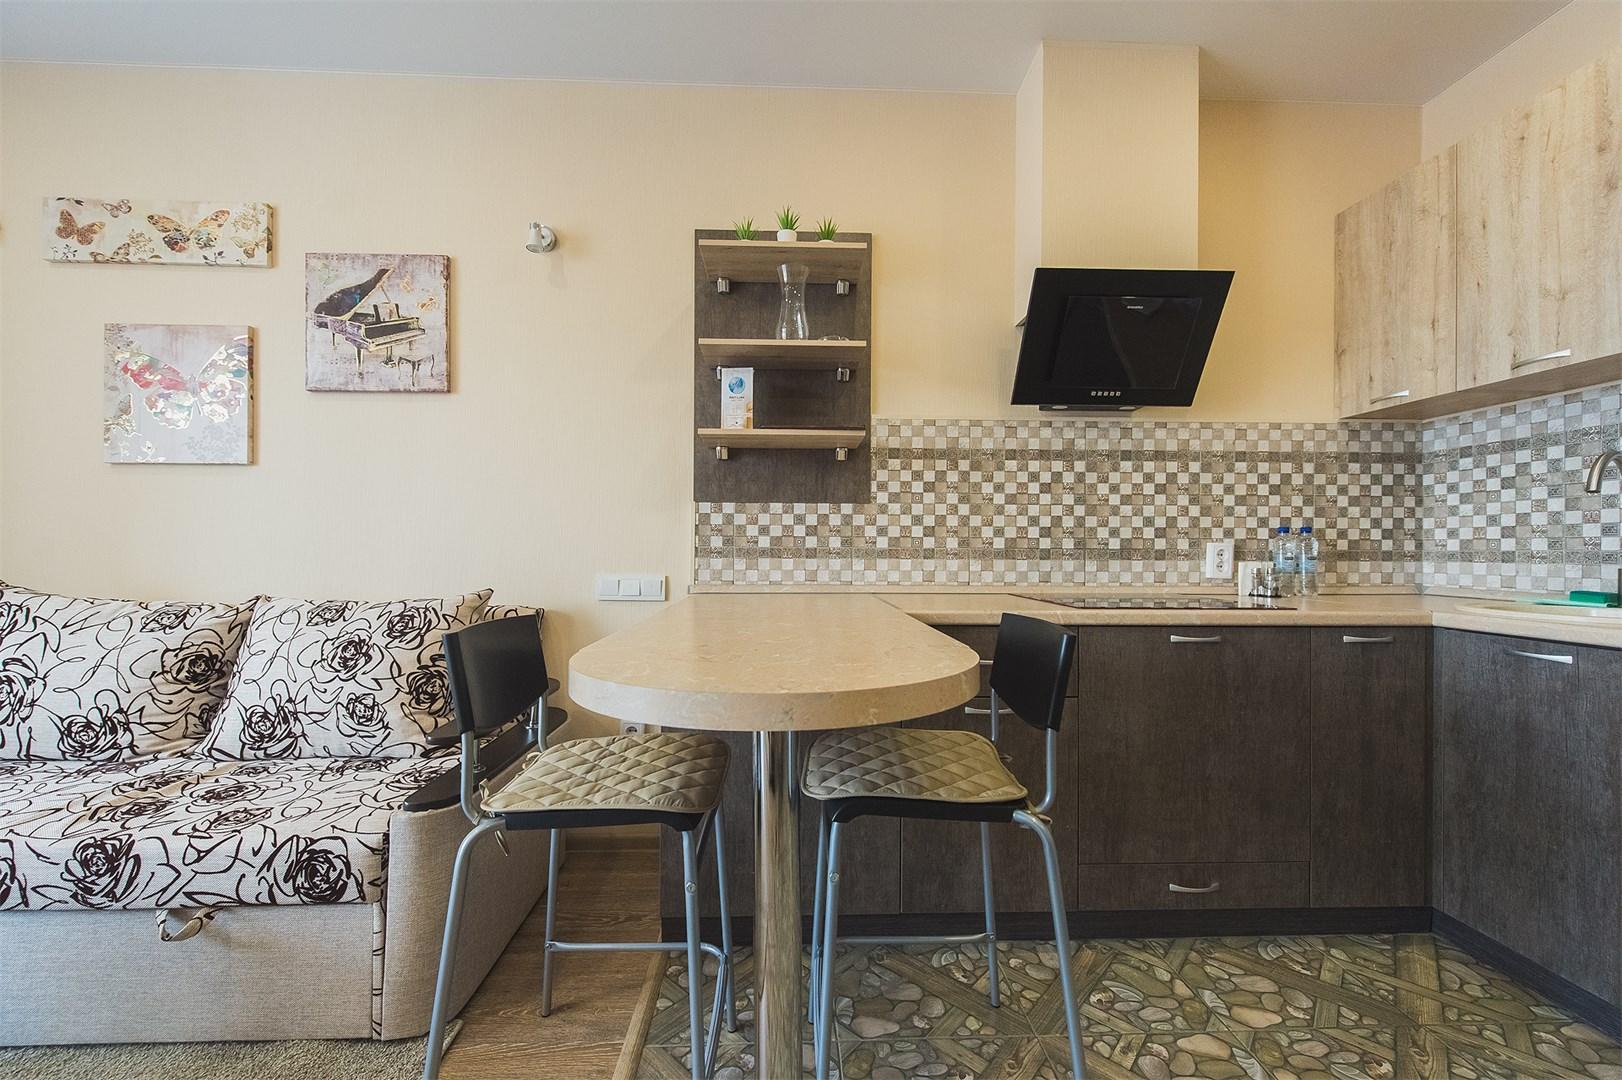 Квартира Abri Luxe.